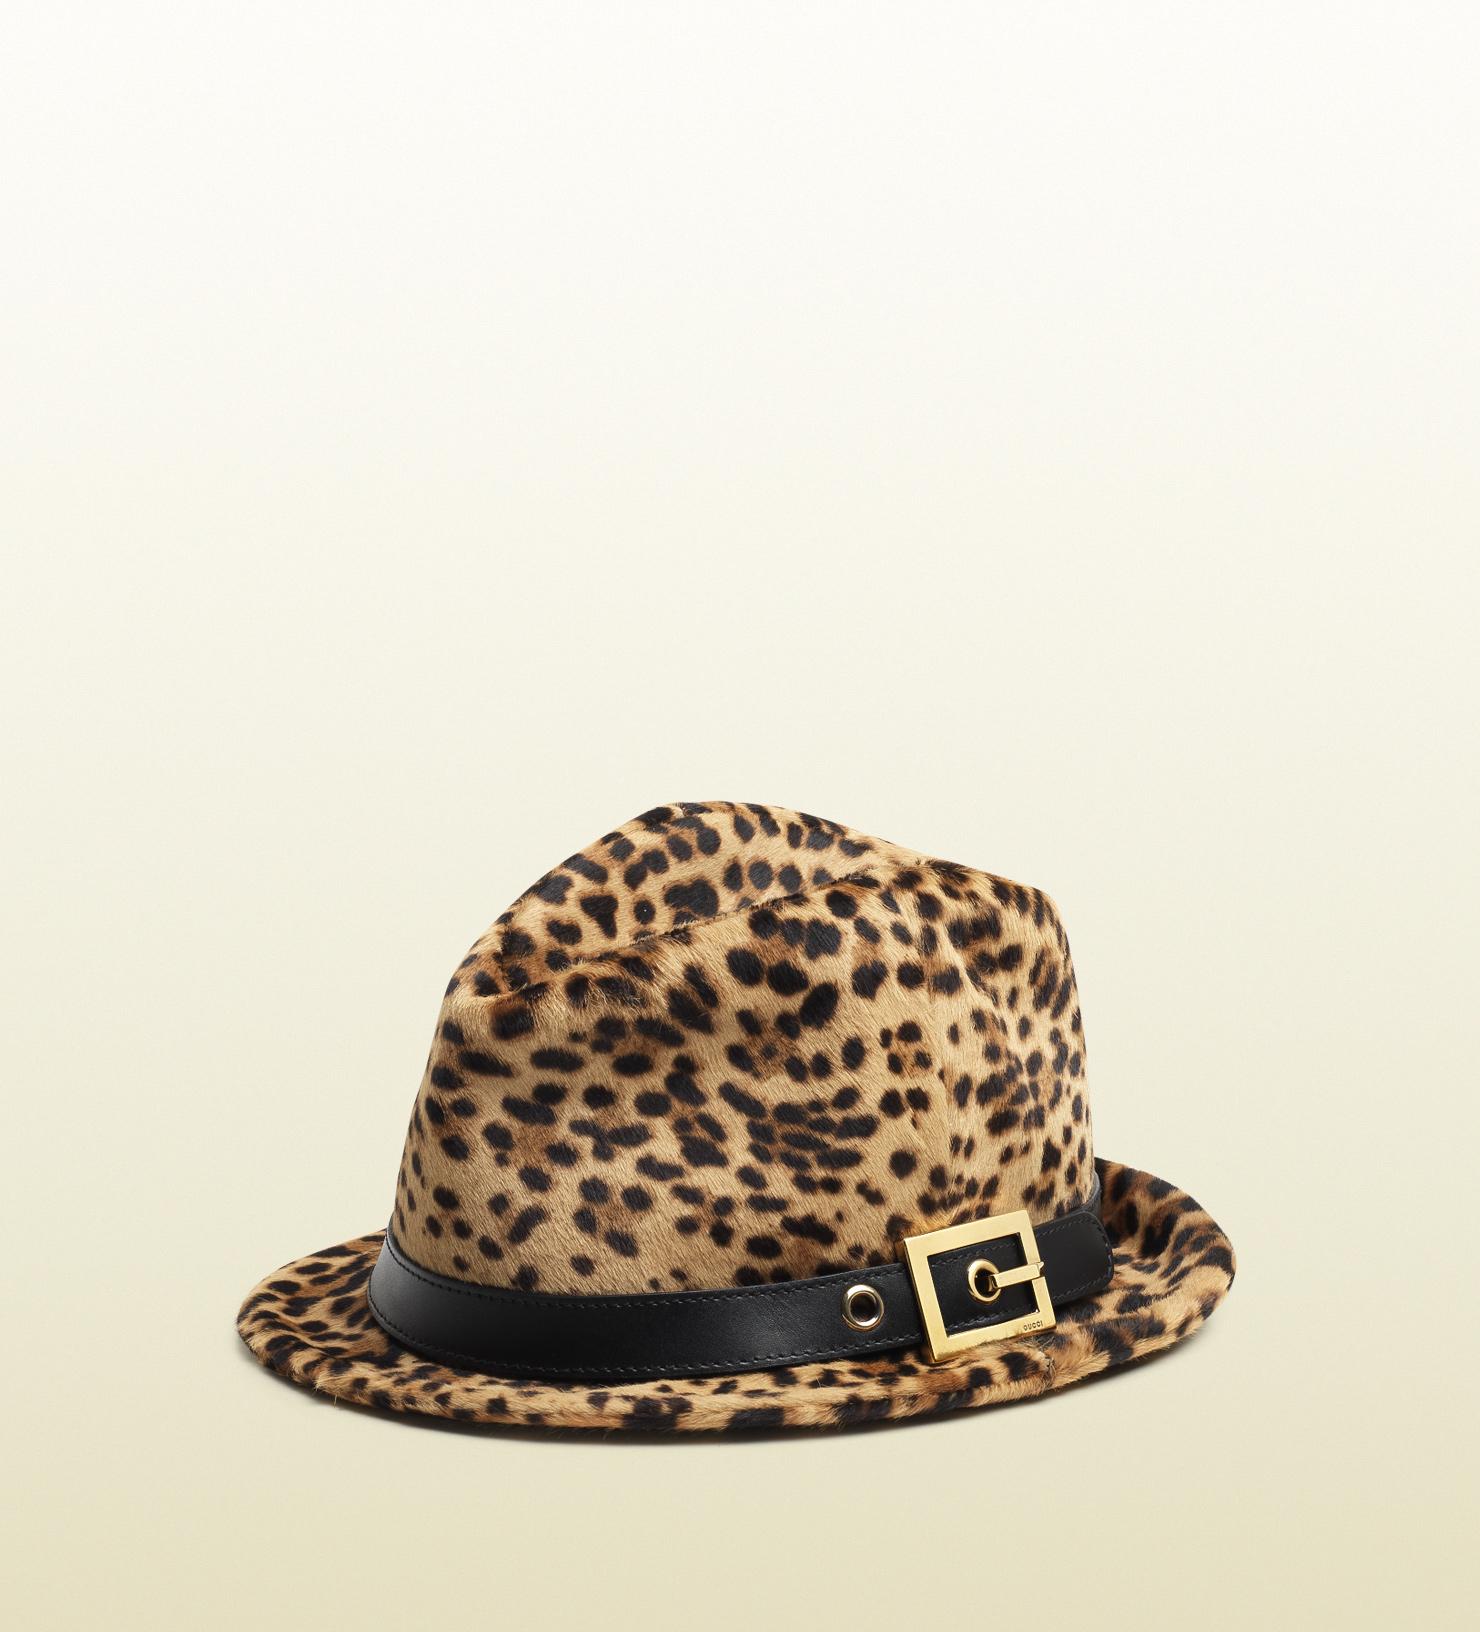 a389686beea30 Gucci - Multicolor Jaguar Printed Leather Fedora for Men - Lyst